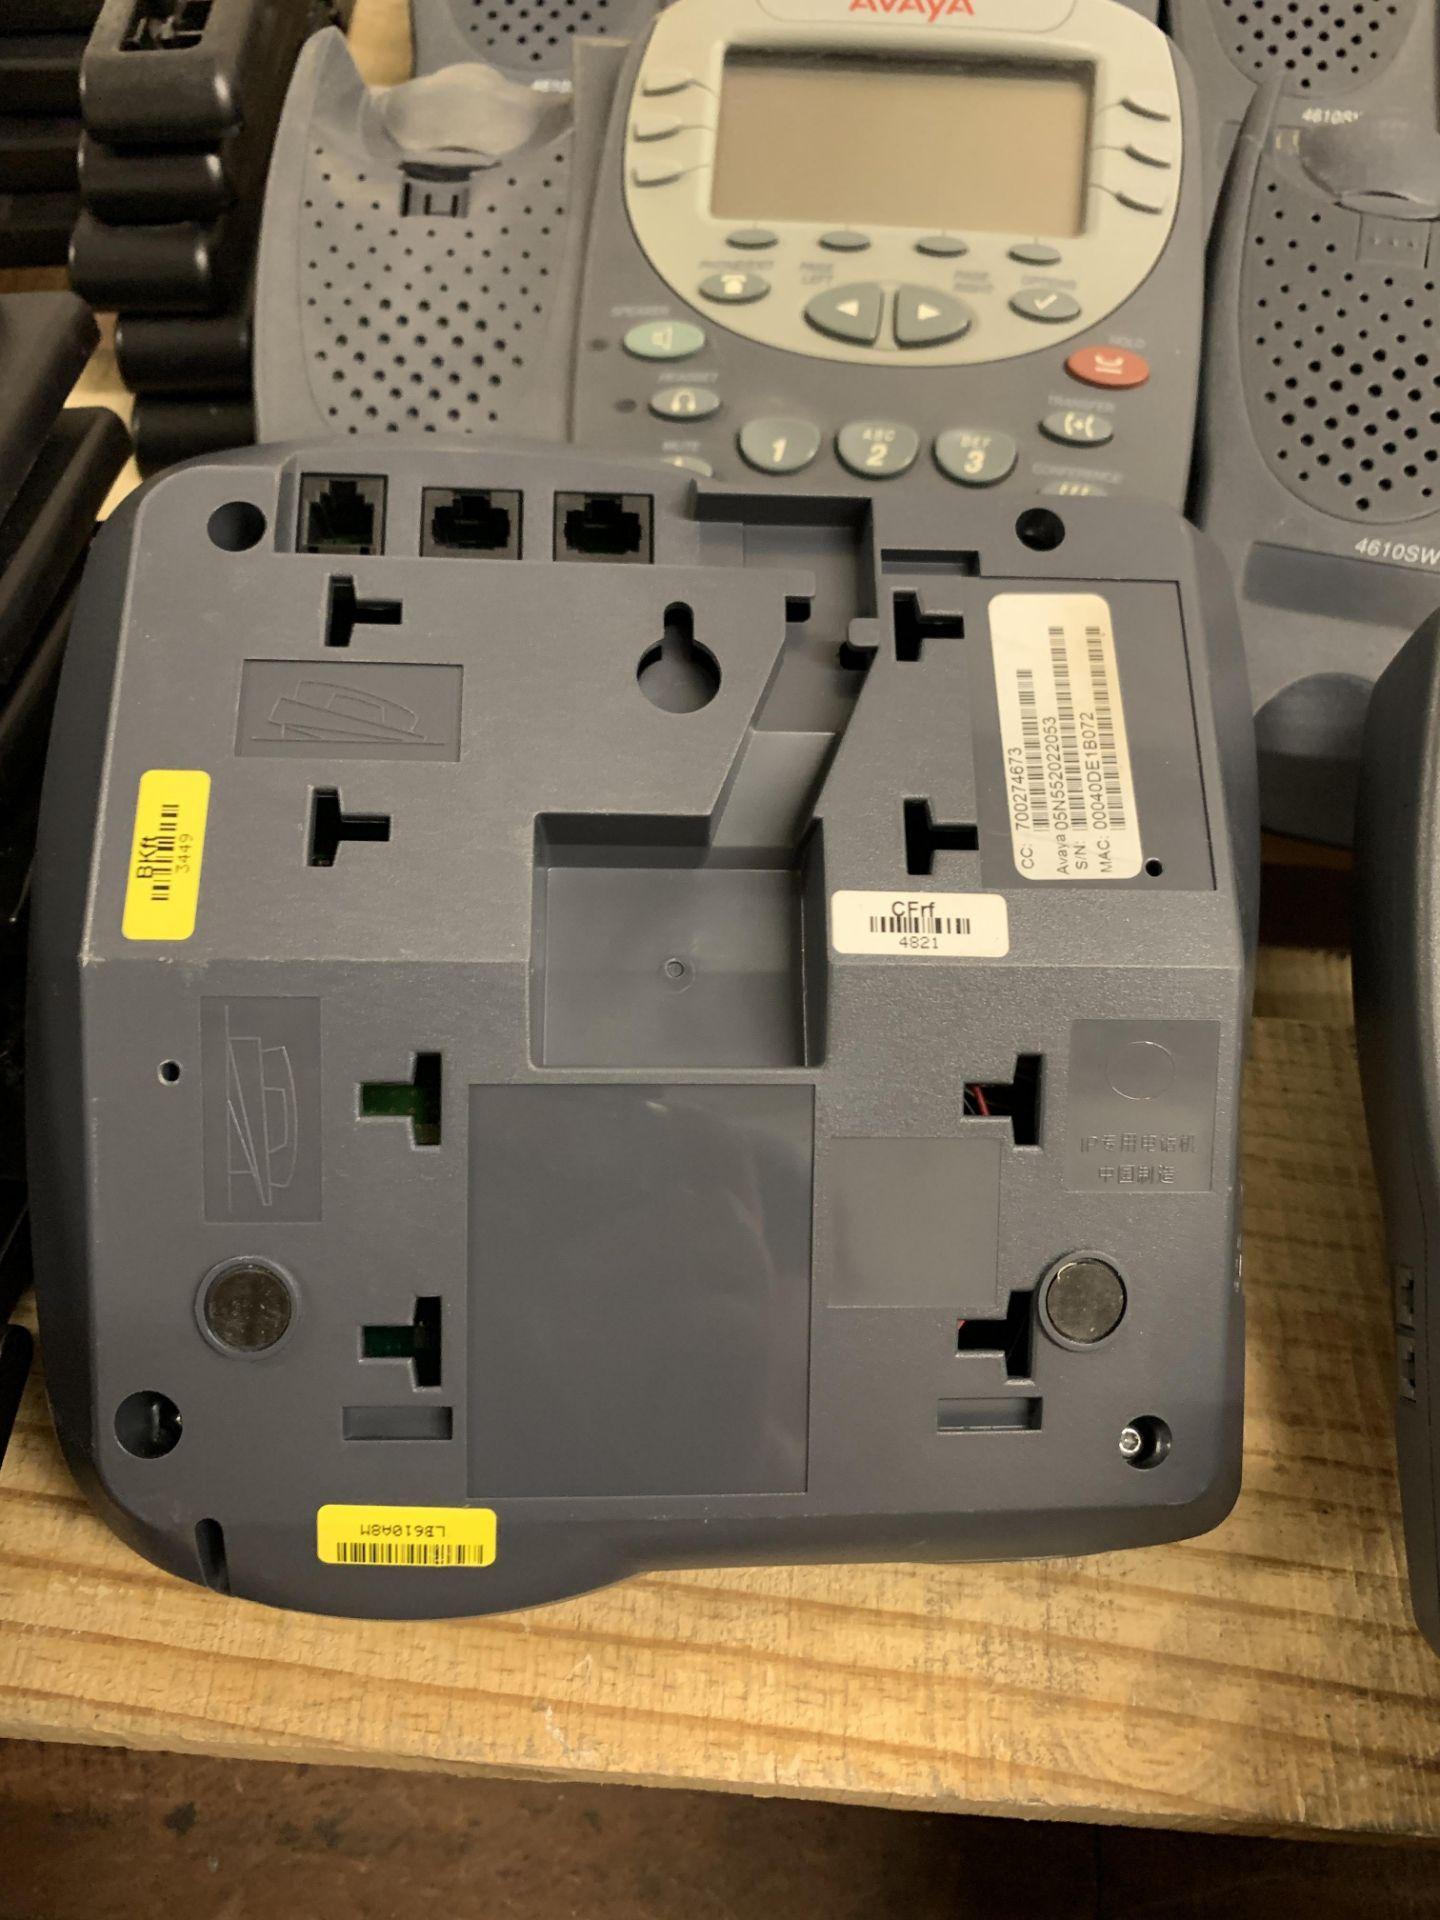 Lot 150 - 10 AVAYA PHONE HANDSETS: 9x MODEL 4610SW IP and 1x 4602 SW IP